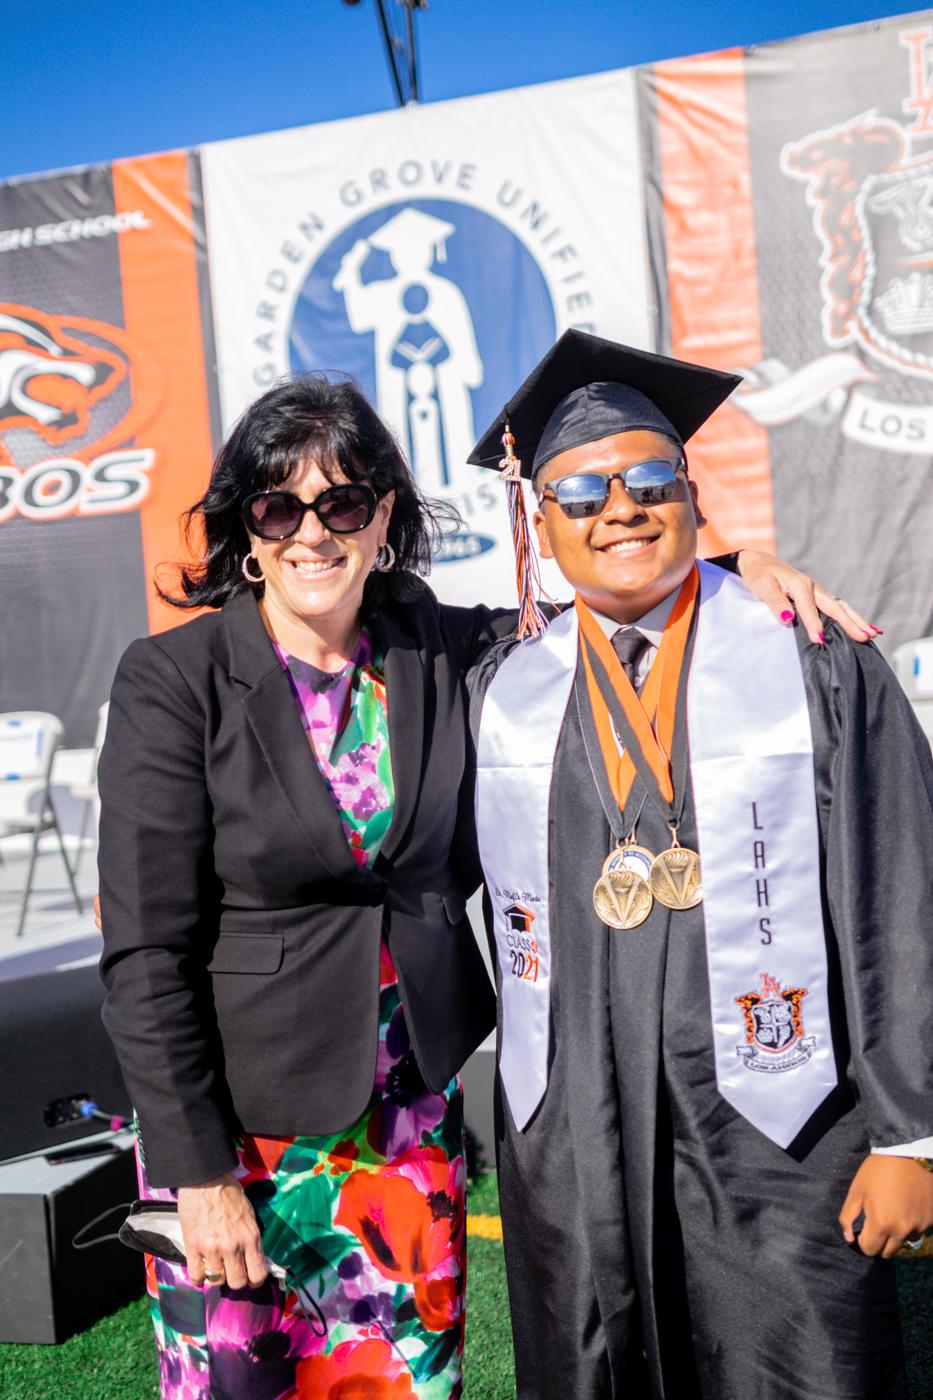 In the news: Harvard-bound student credits success to Garden Grove superintendent's mentor program